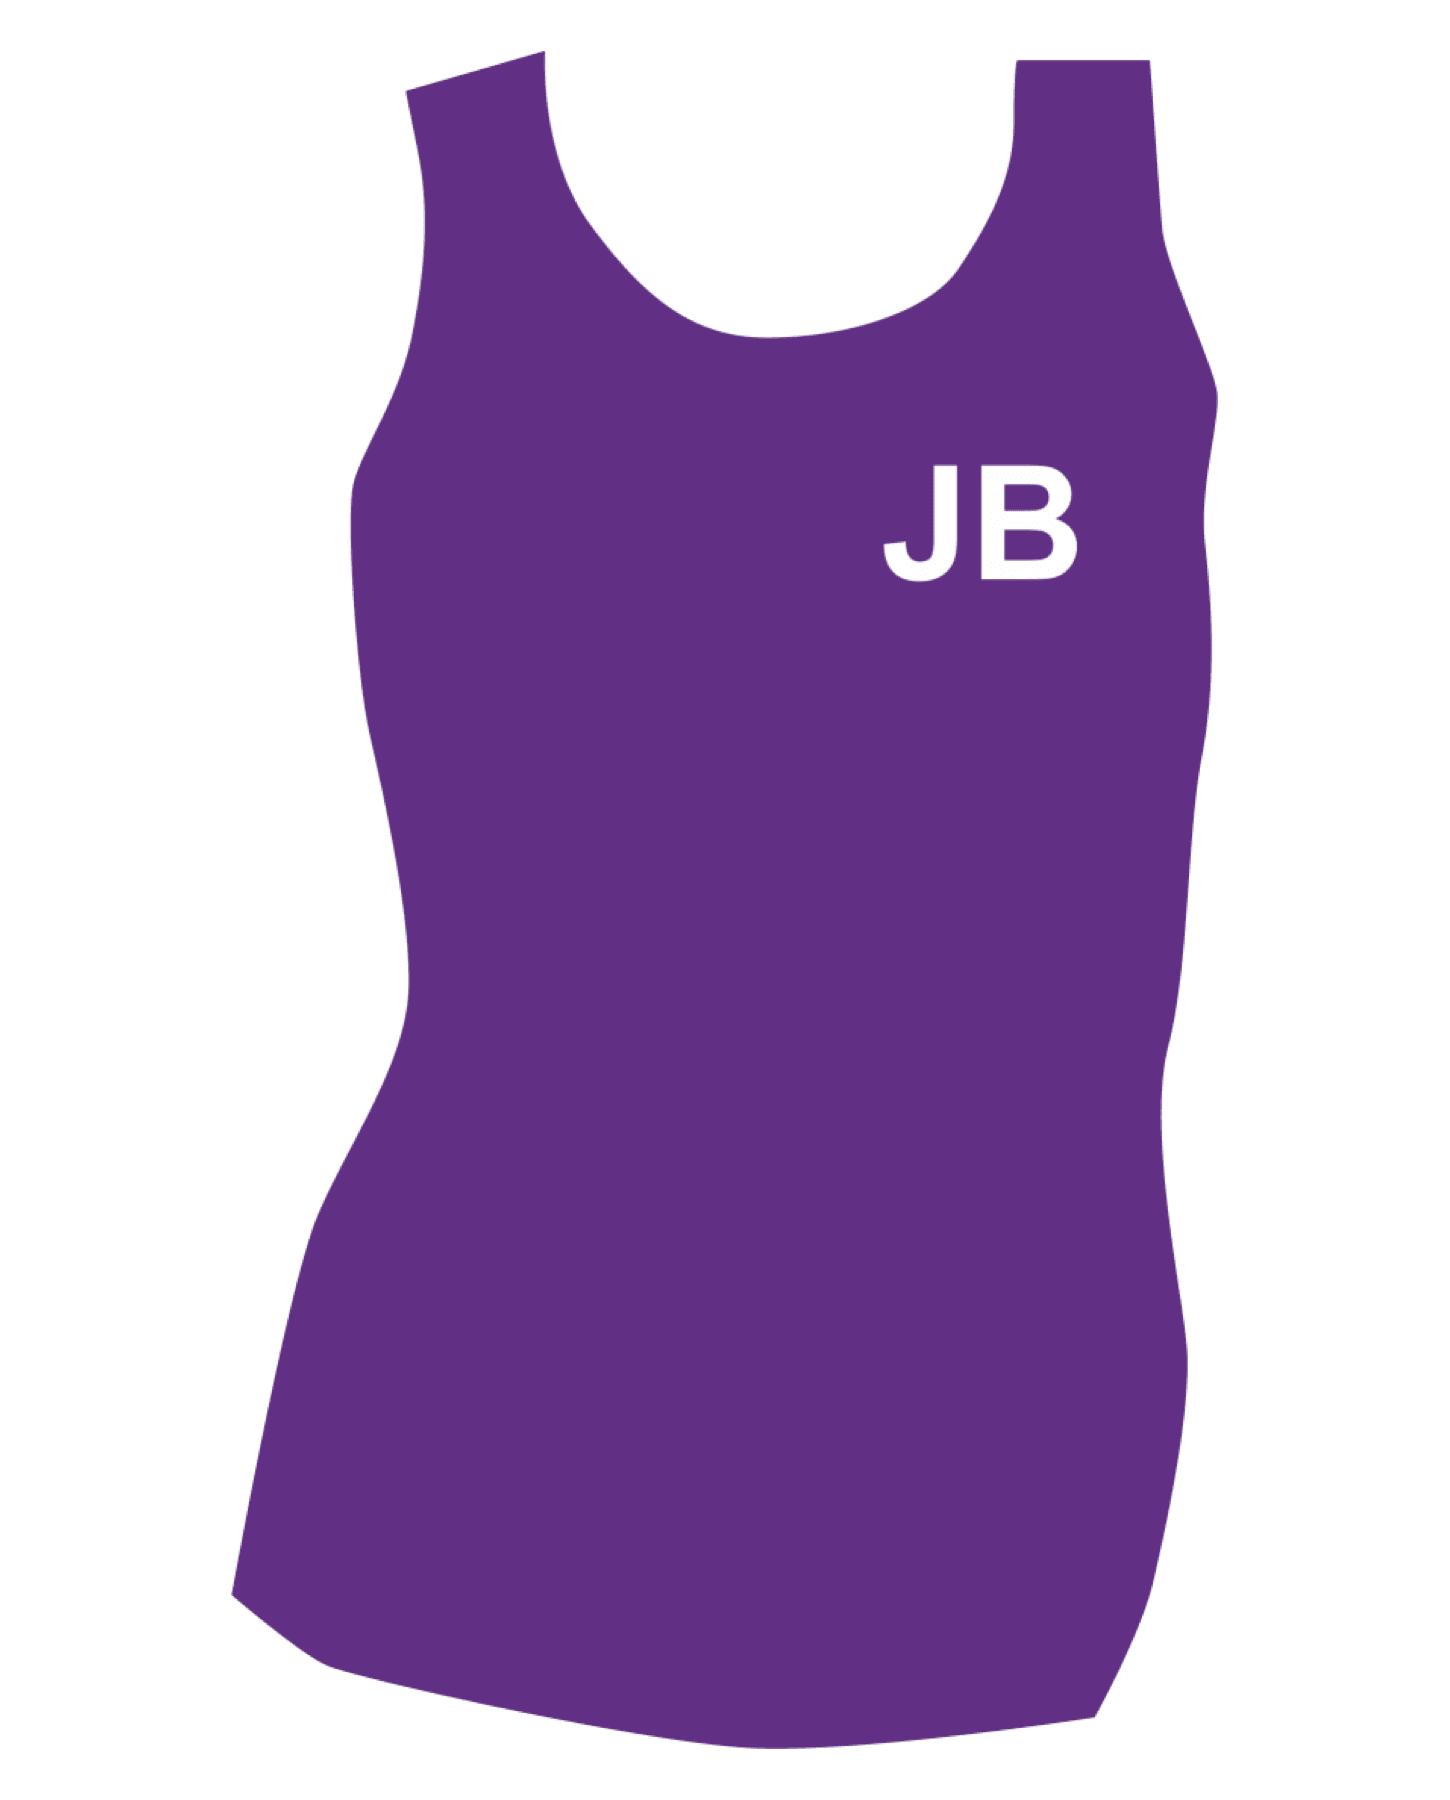 Cottenham Jaguars Netball Club – Vest Lady Fit